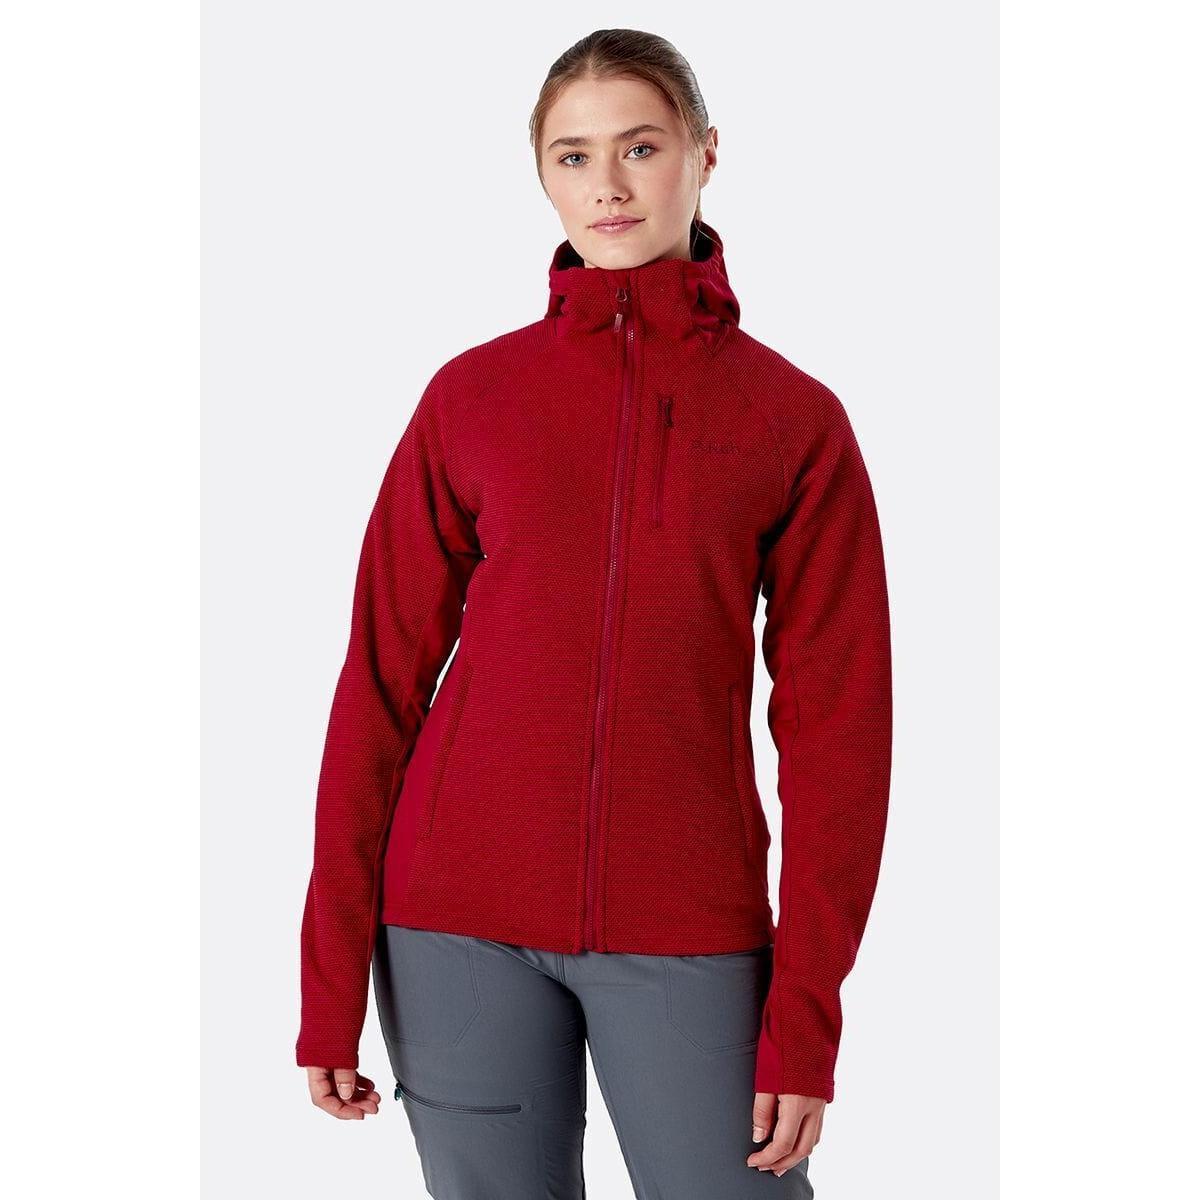 Rab Women's Rab Capacitor Fleece Hoody - Red